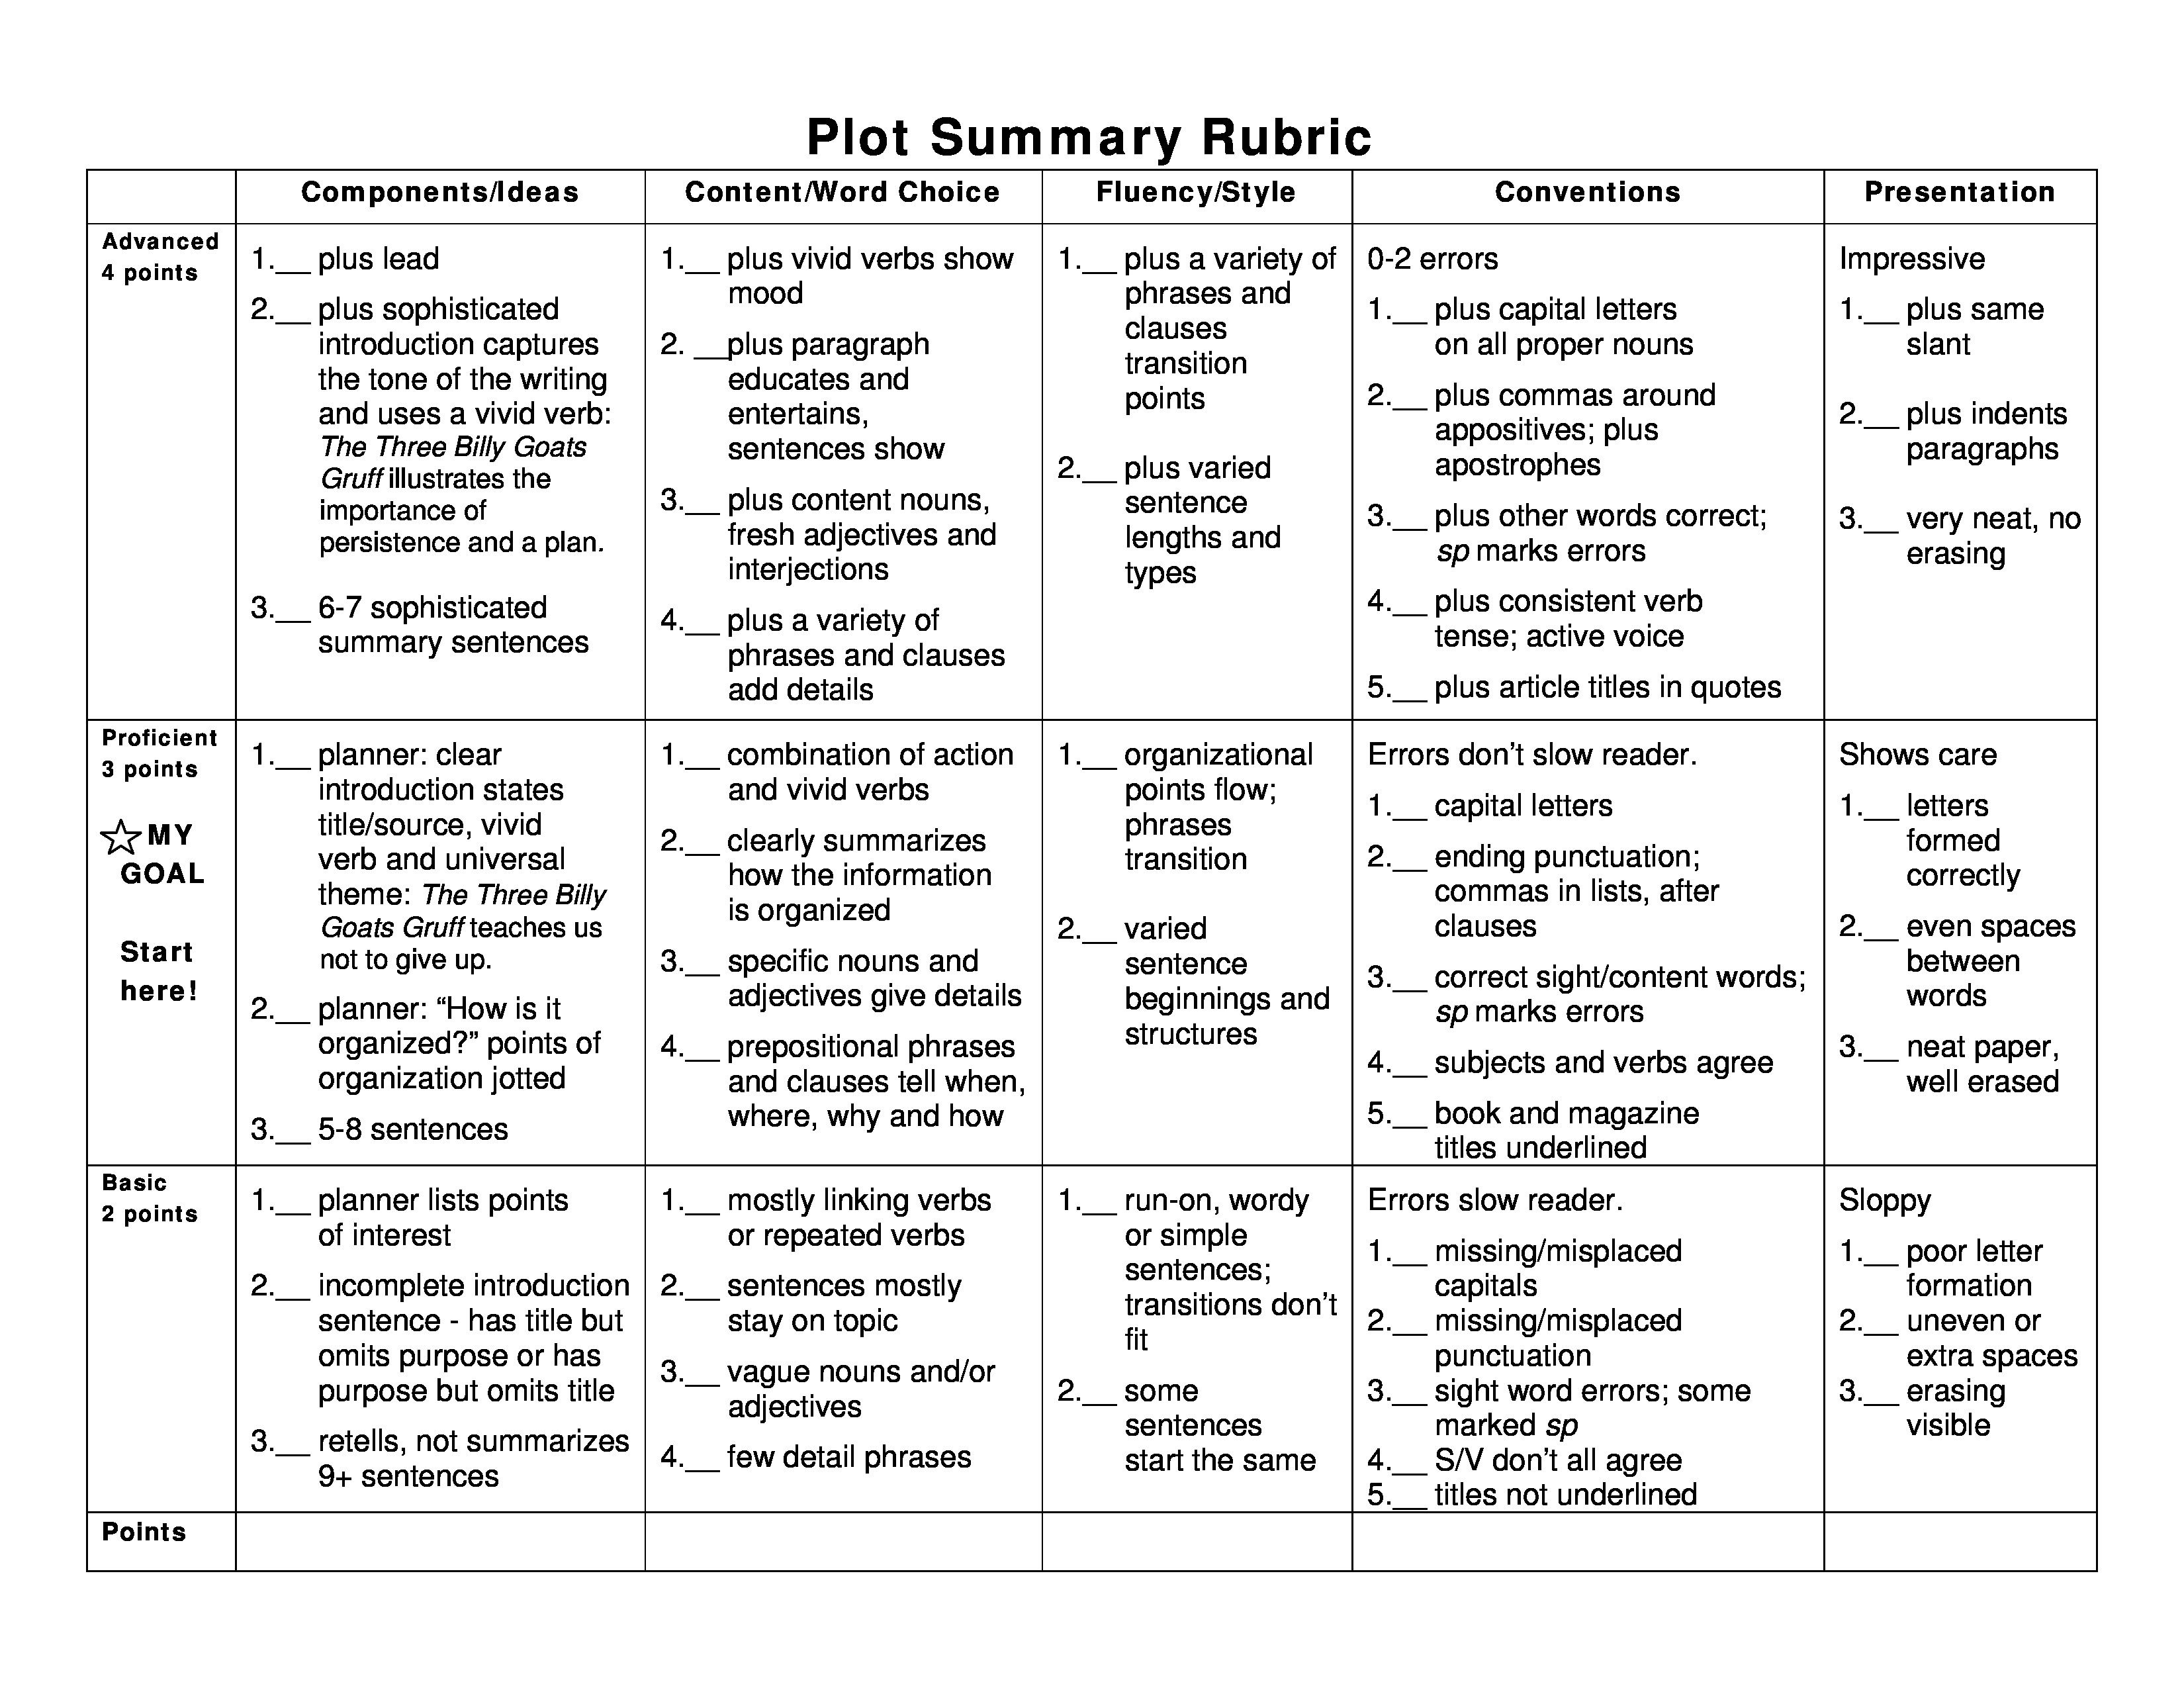 Rubric Plot Summary Rubric